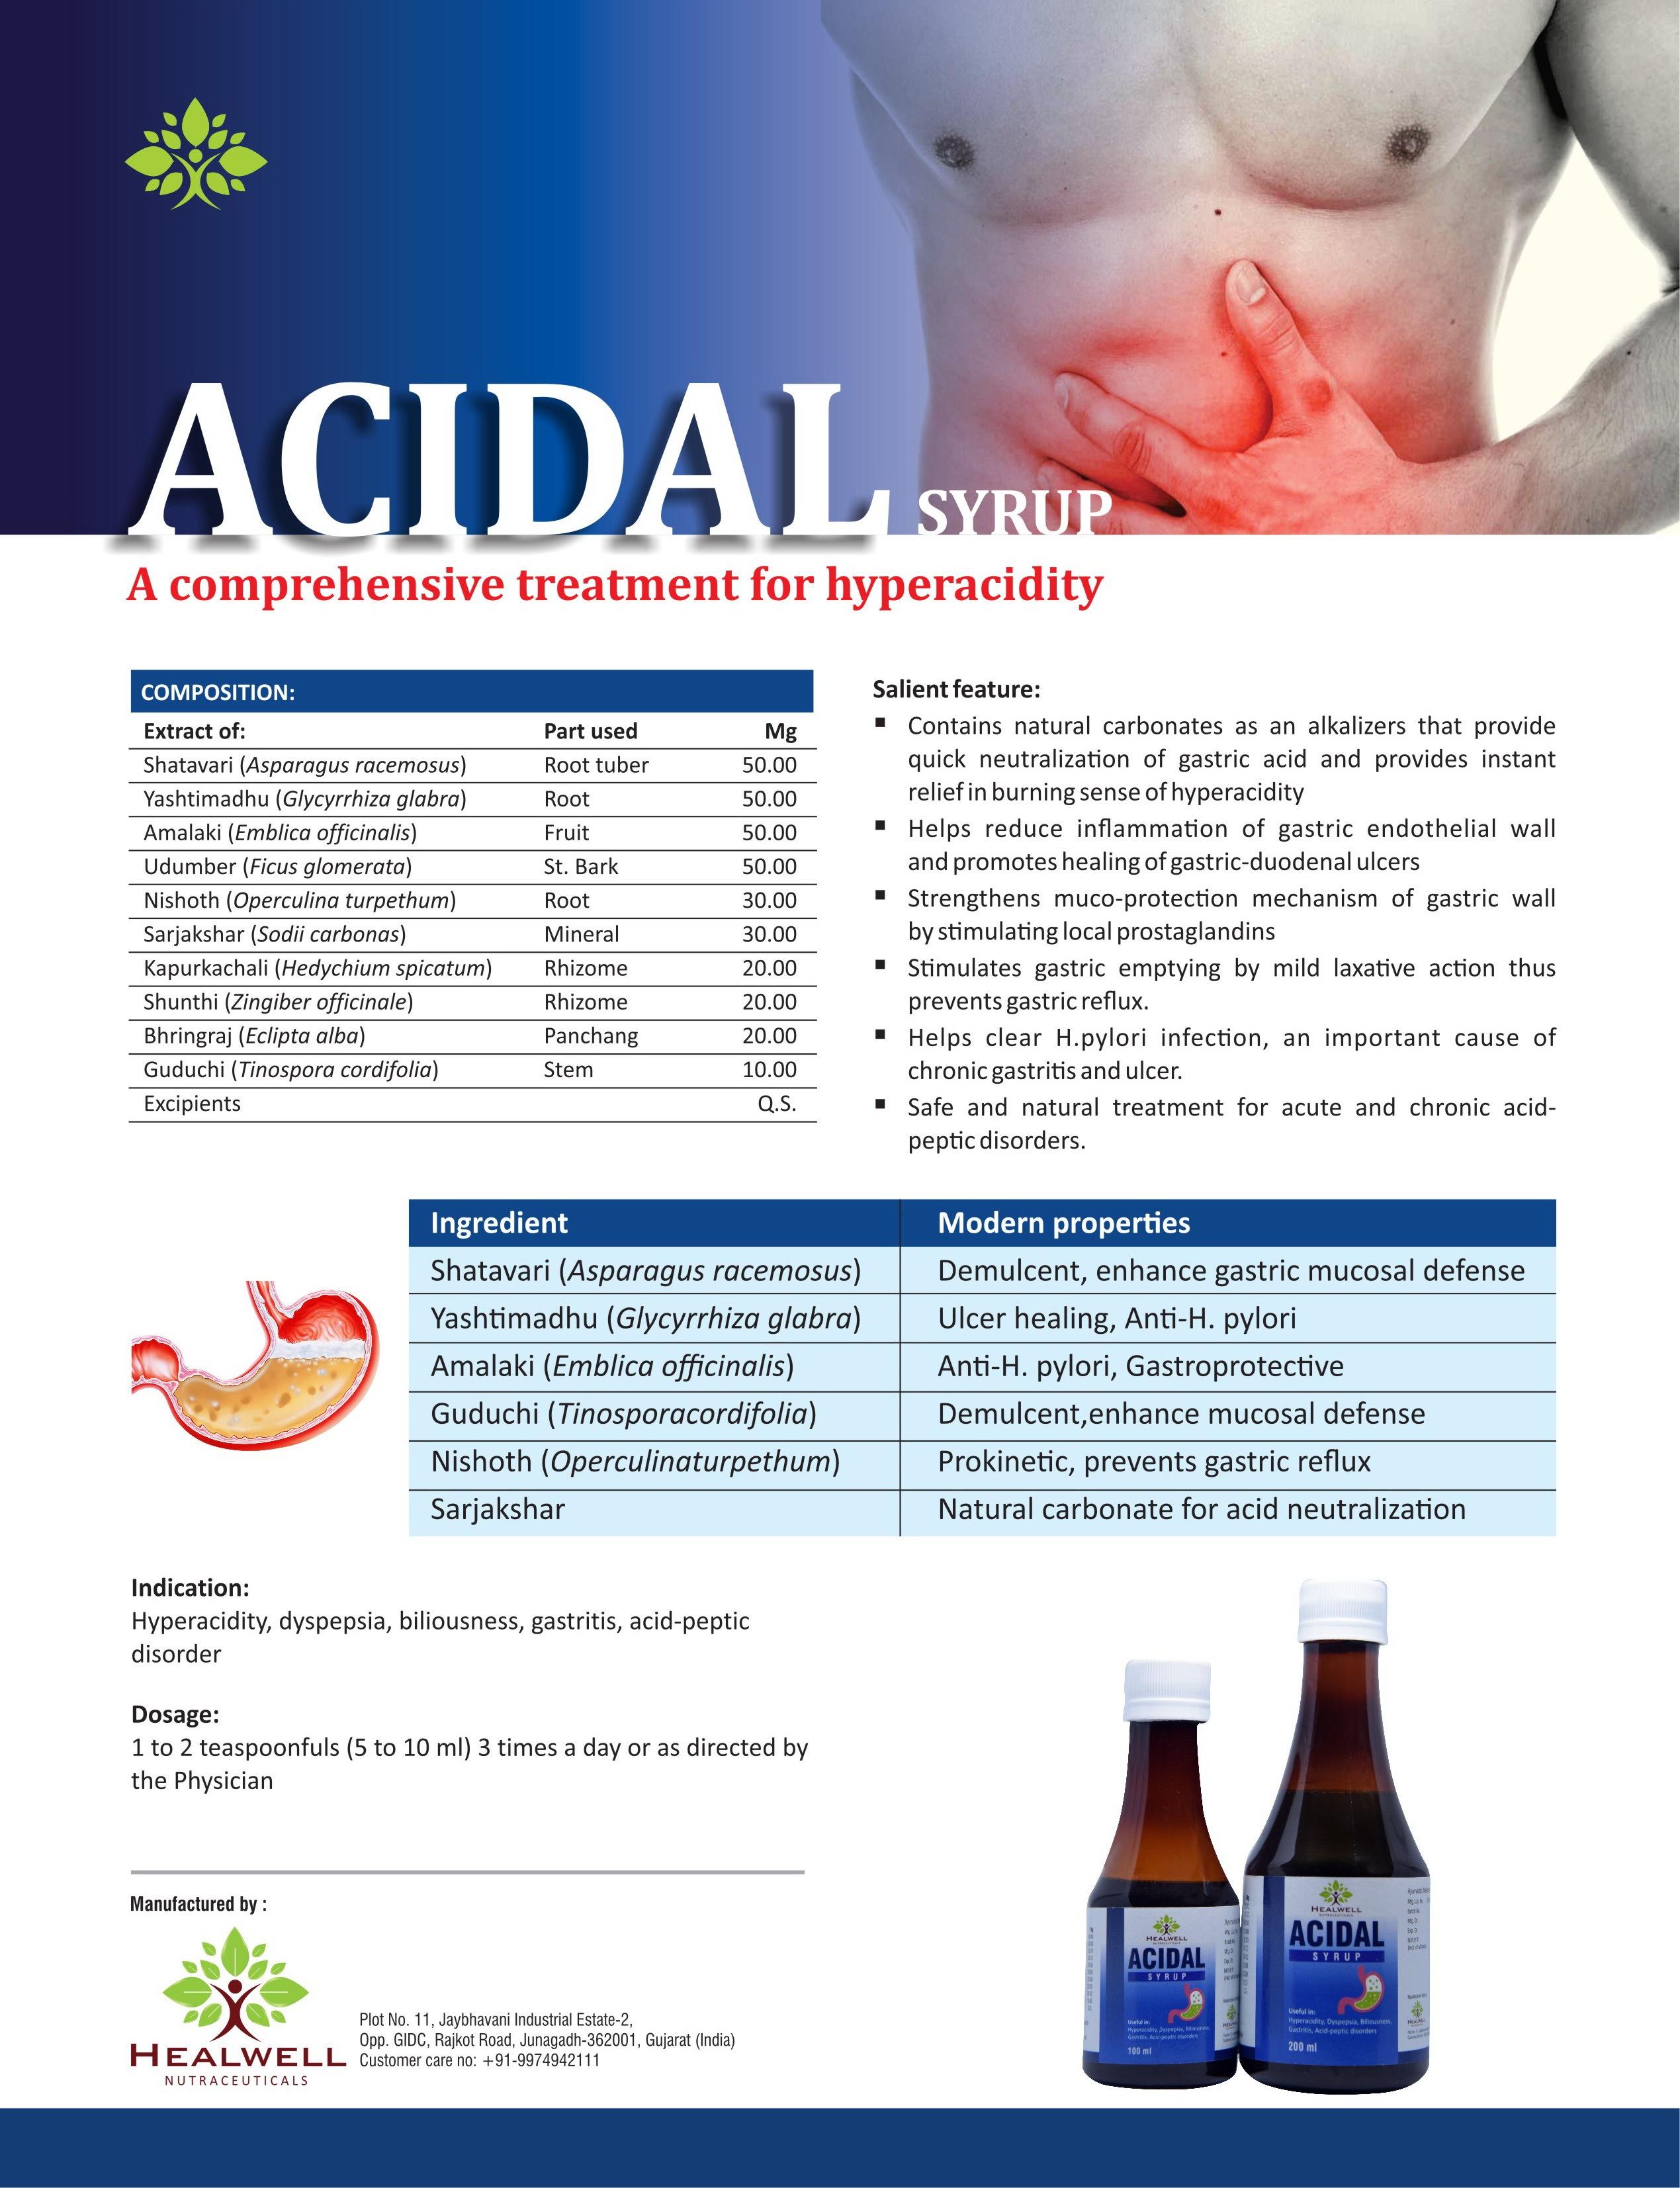 Herbal Acidal Syrup